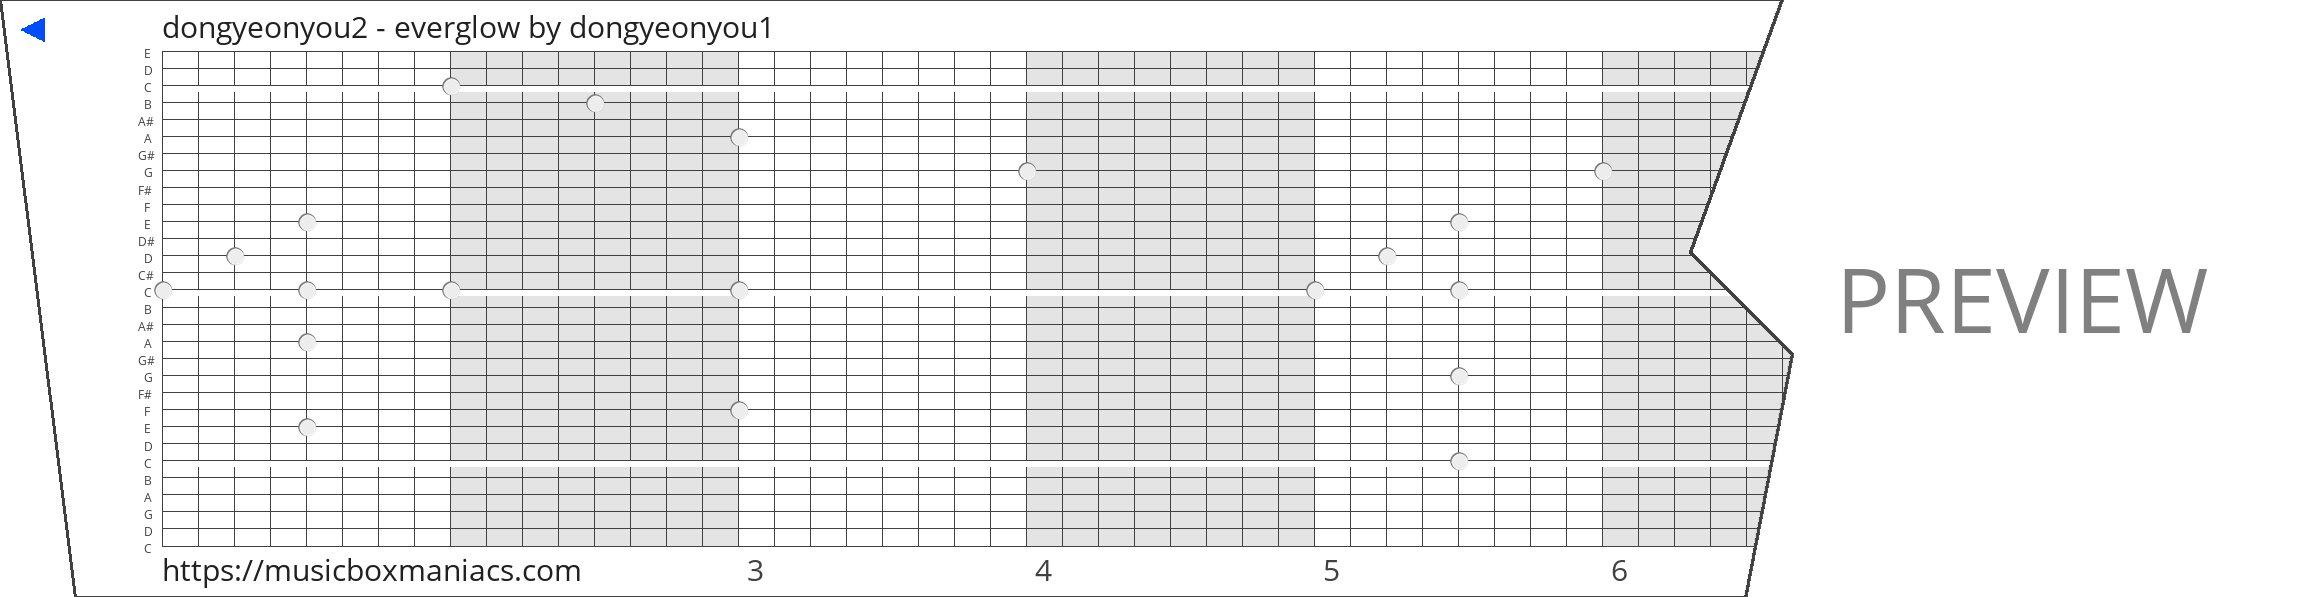 dongyeonyou2 - everglow 30 note music box paper strip